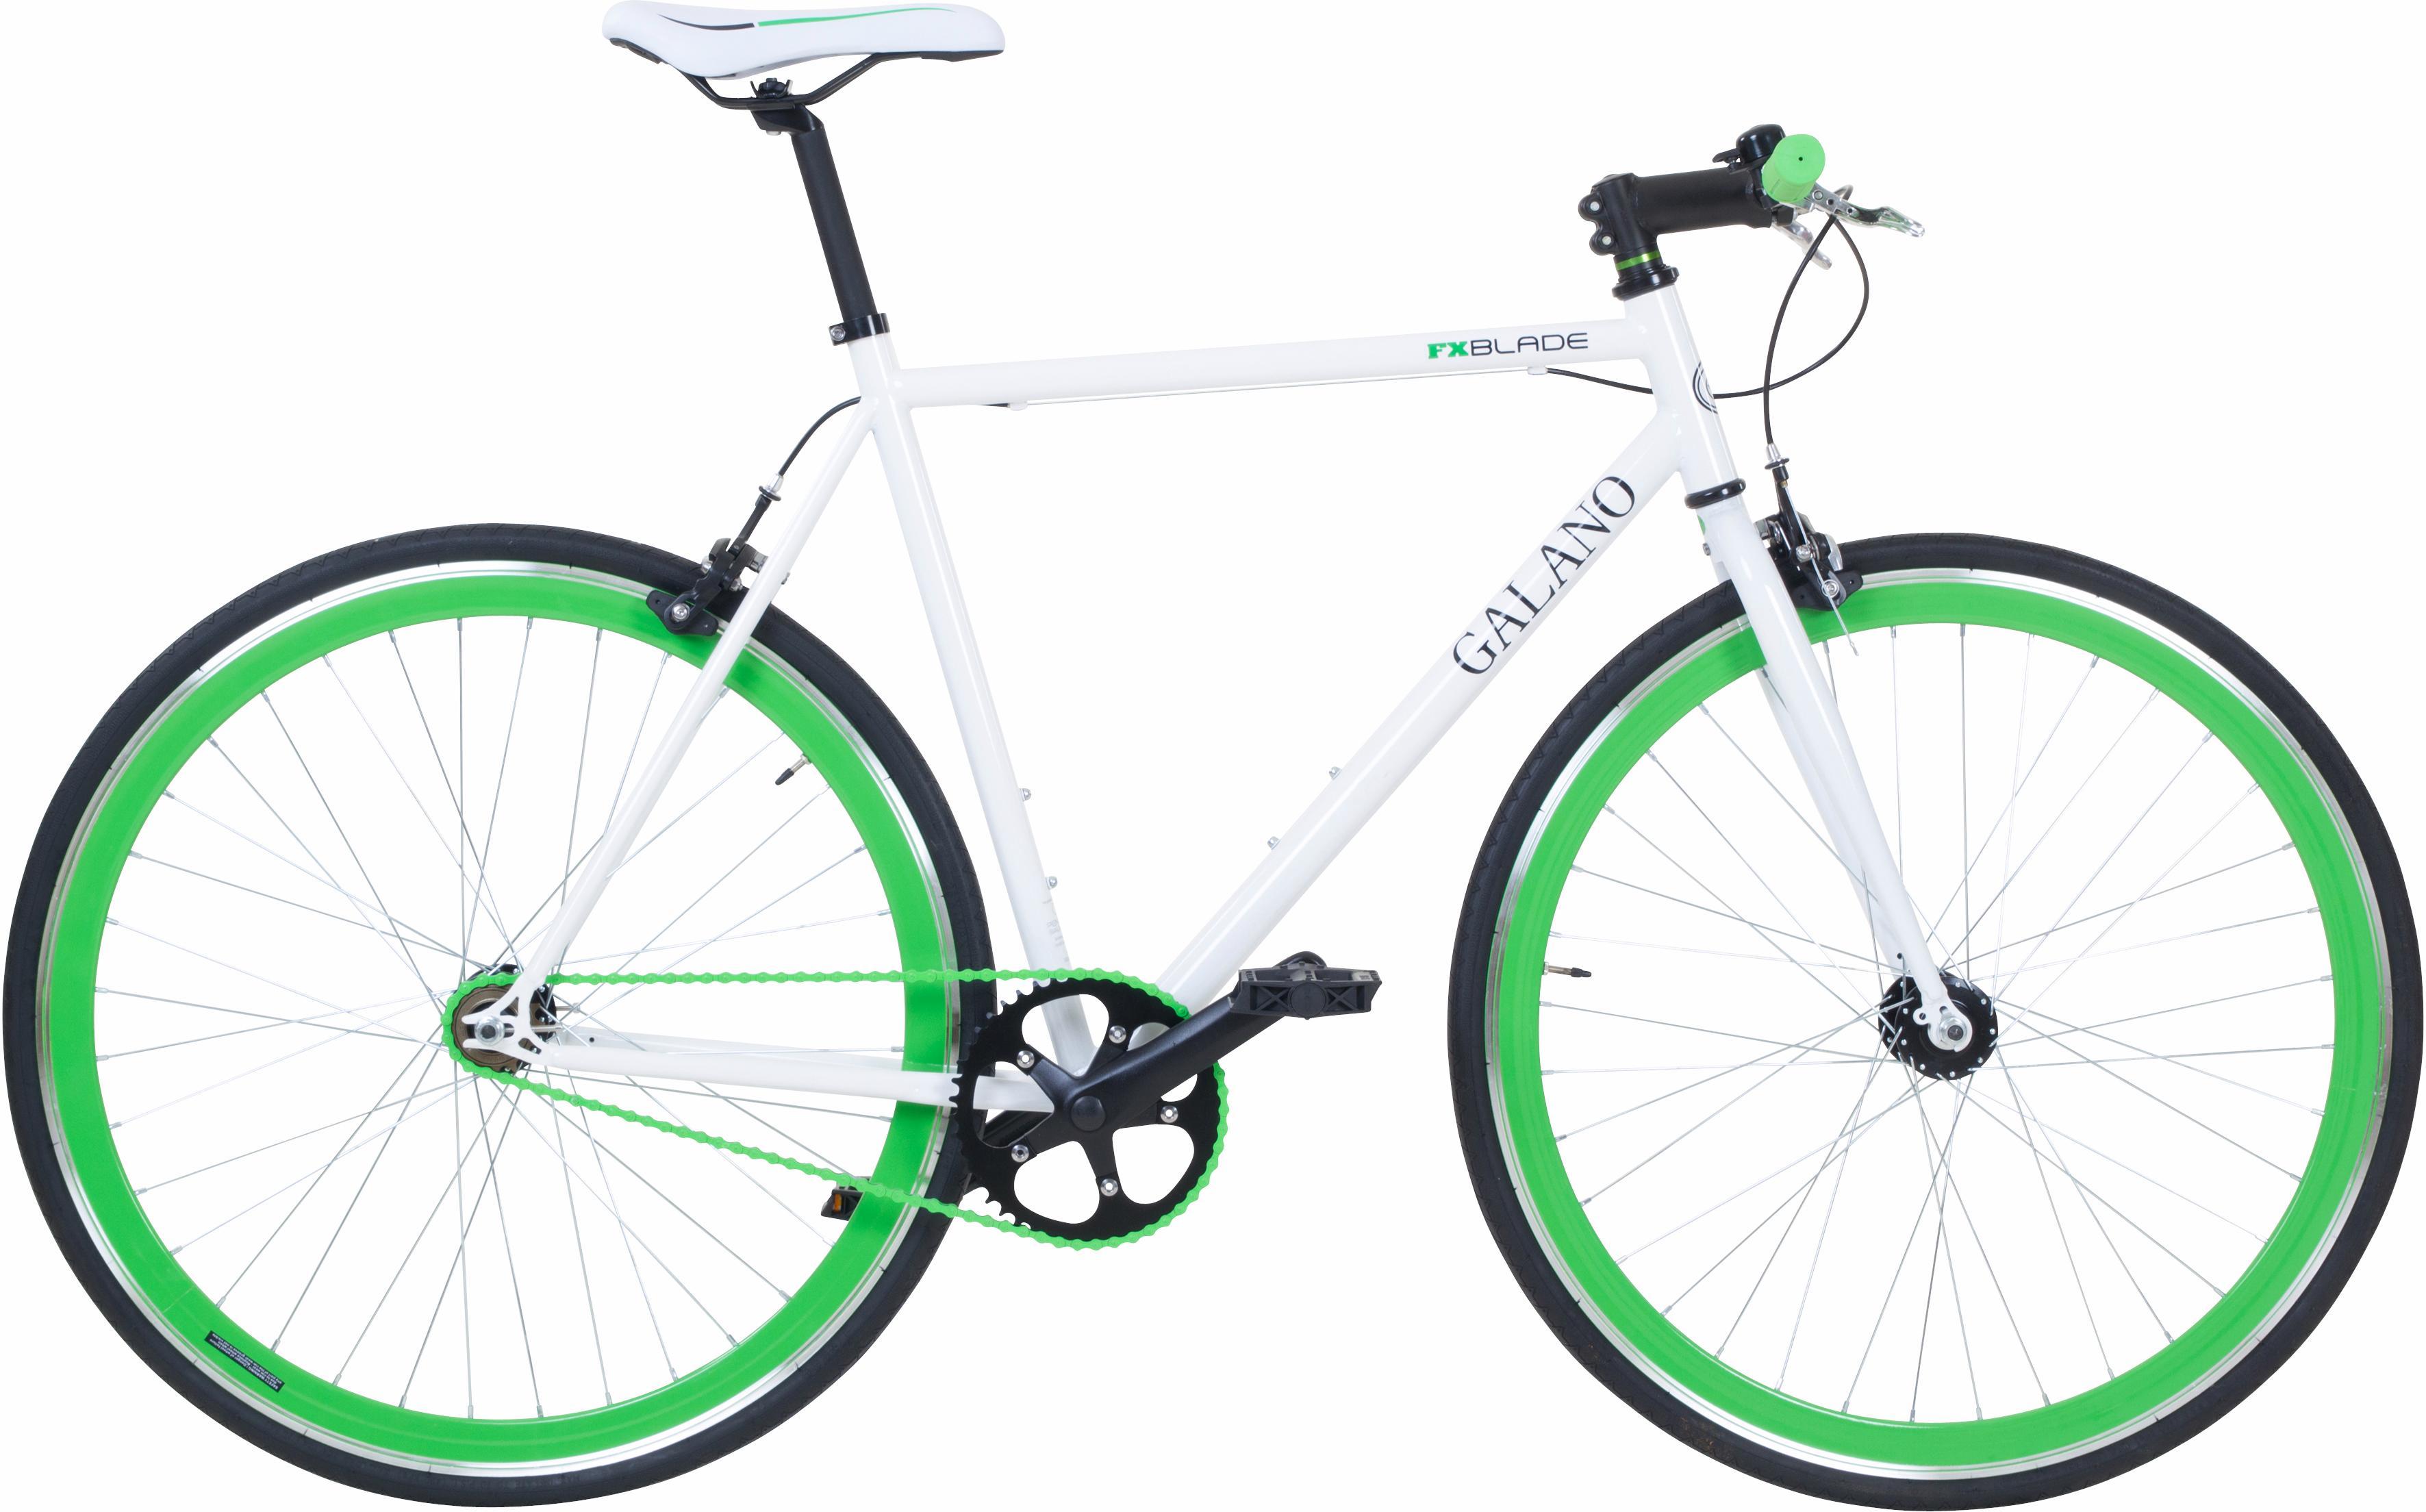 Galano Singlespeed Blade weiß Damen Damenfahrräder Fahrräder Zubehör Fahrrad